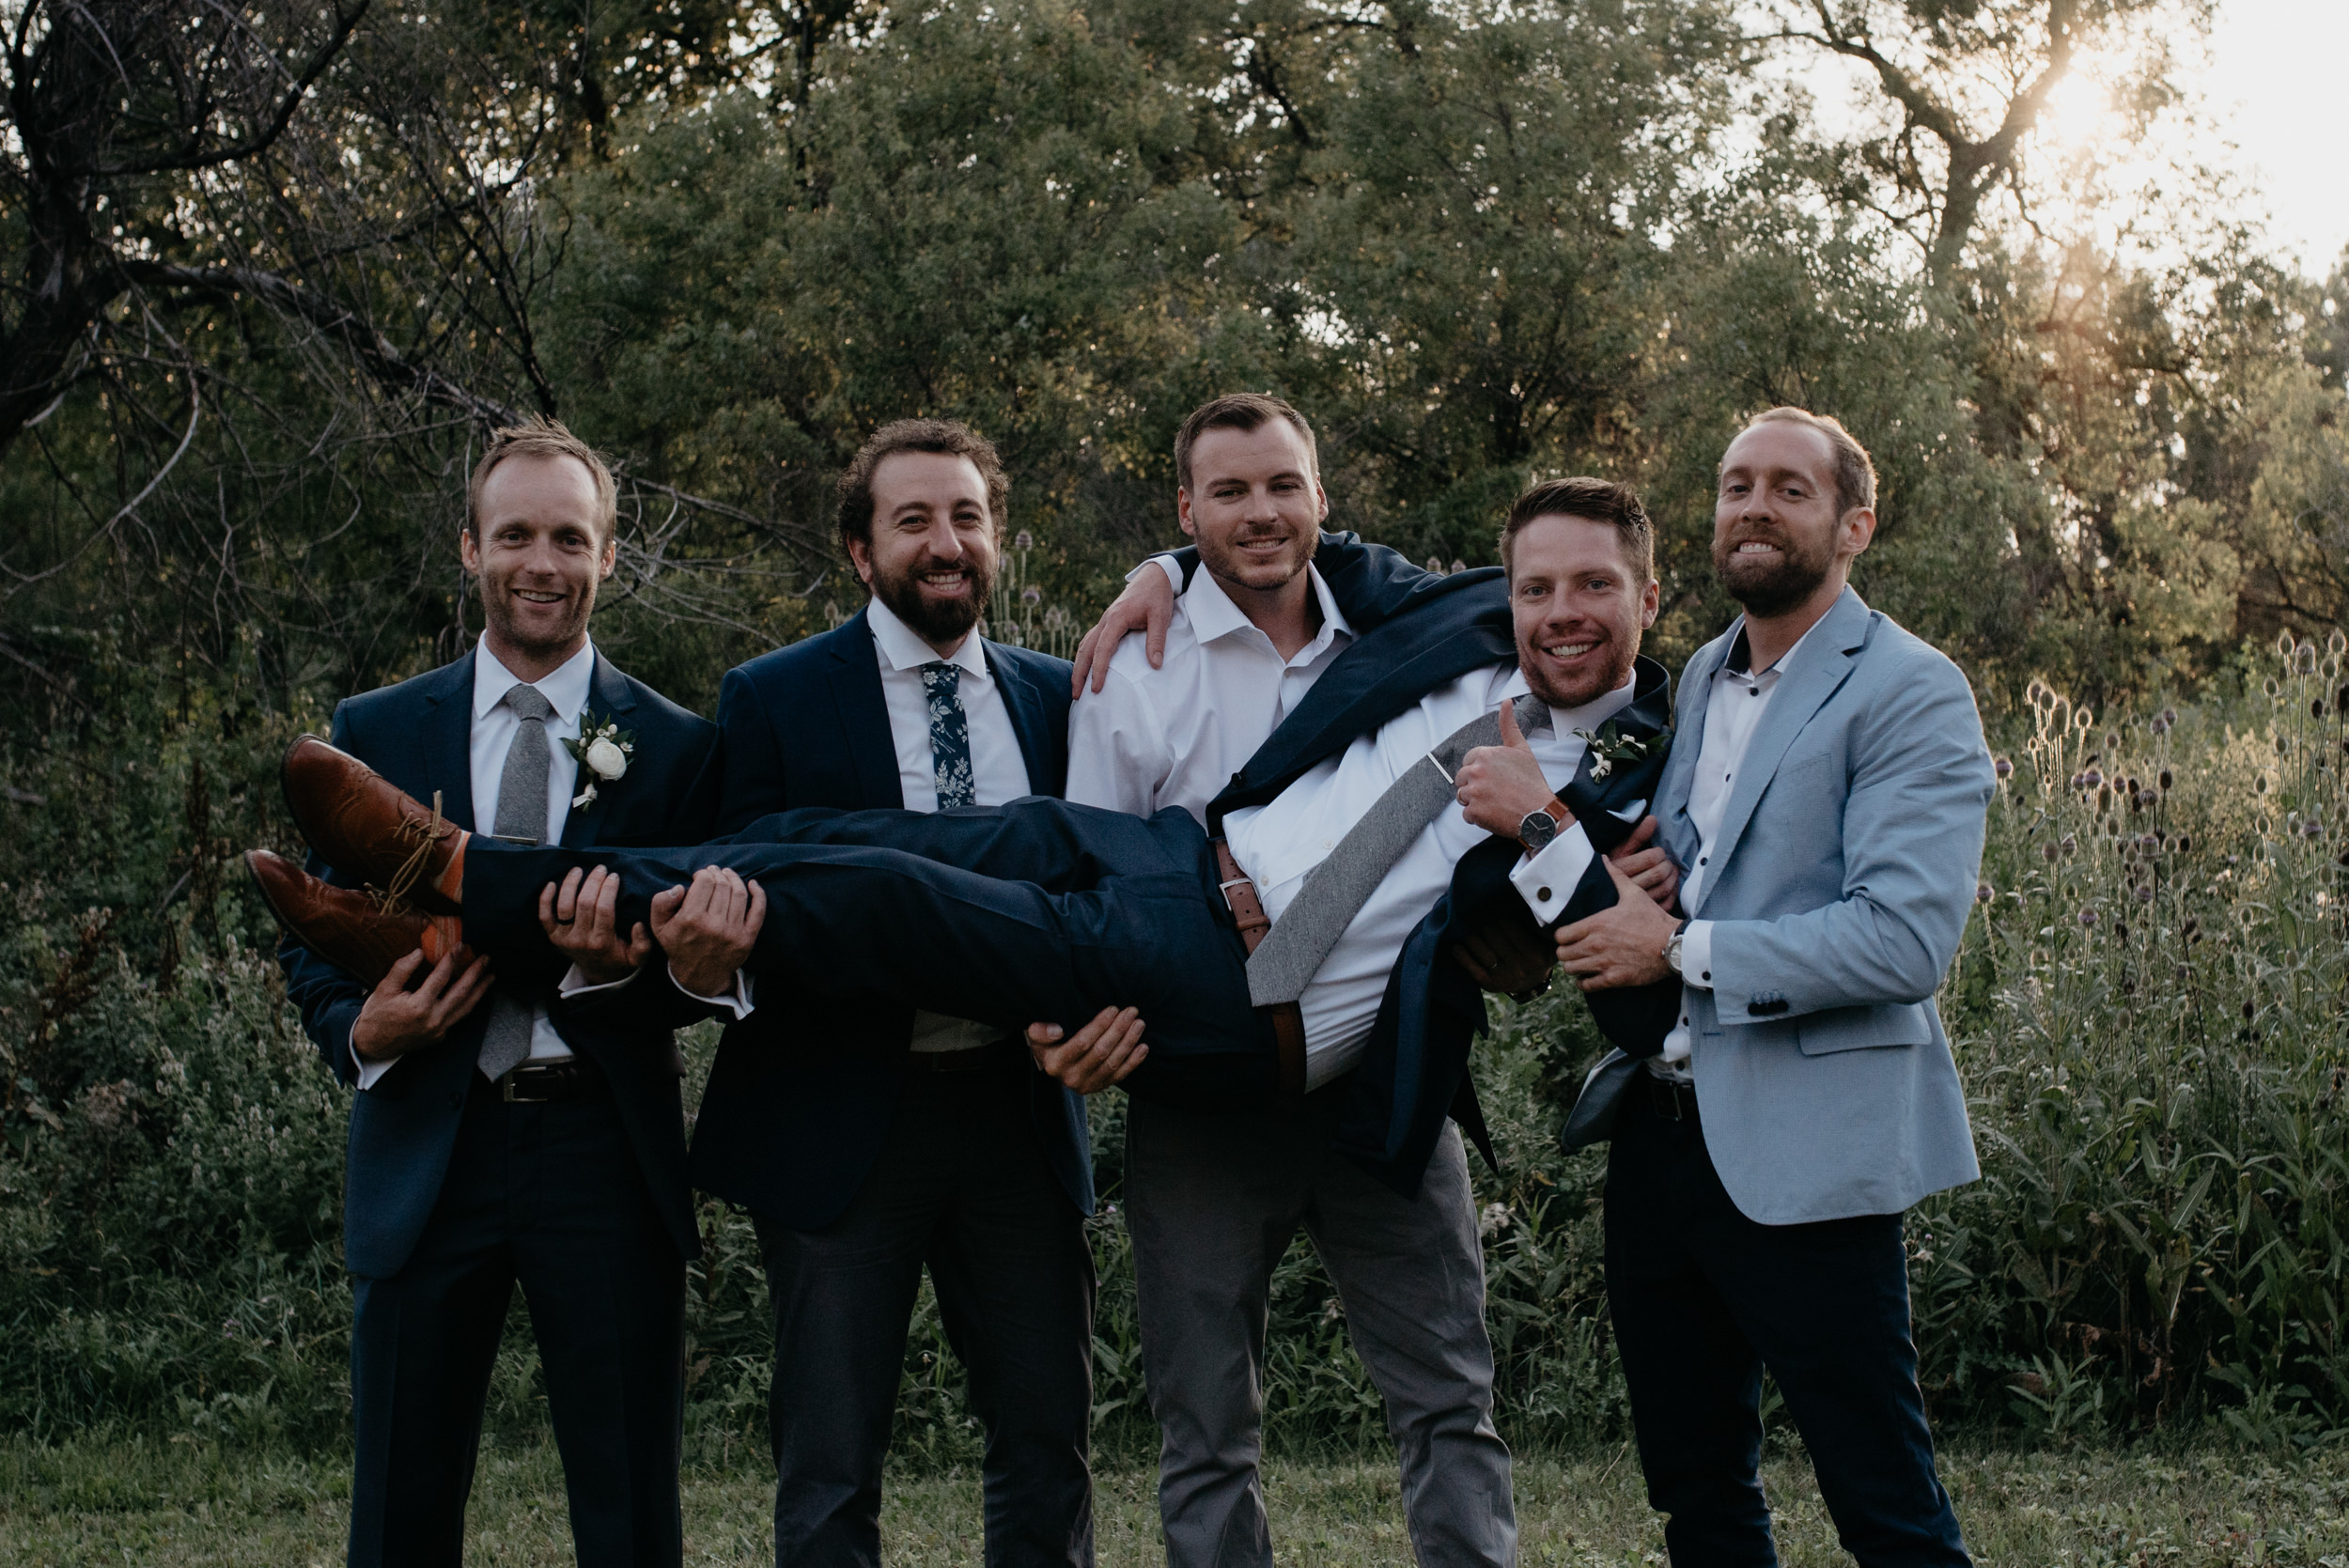 Breckenridge, Colorado wedding photographer. Colorado mountain wedding venue. Colorado elopement and wedding photography.